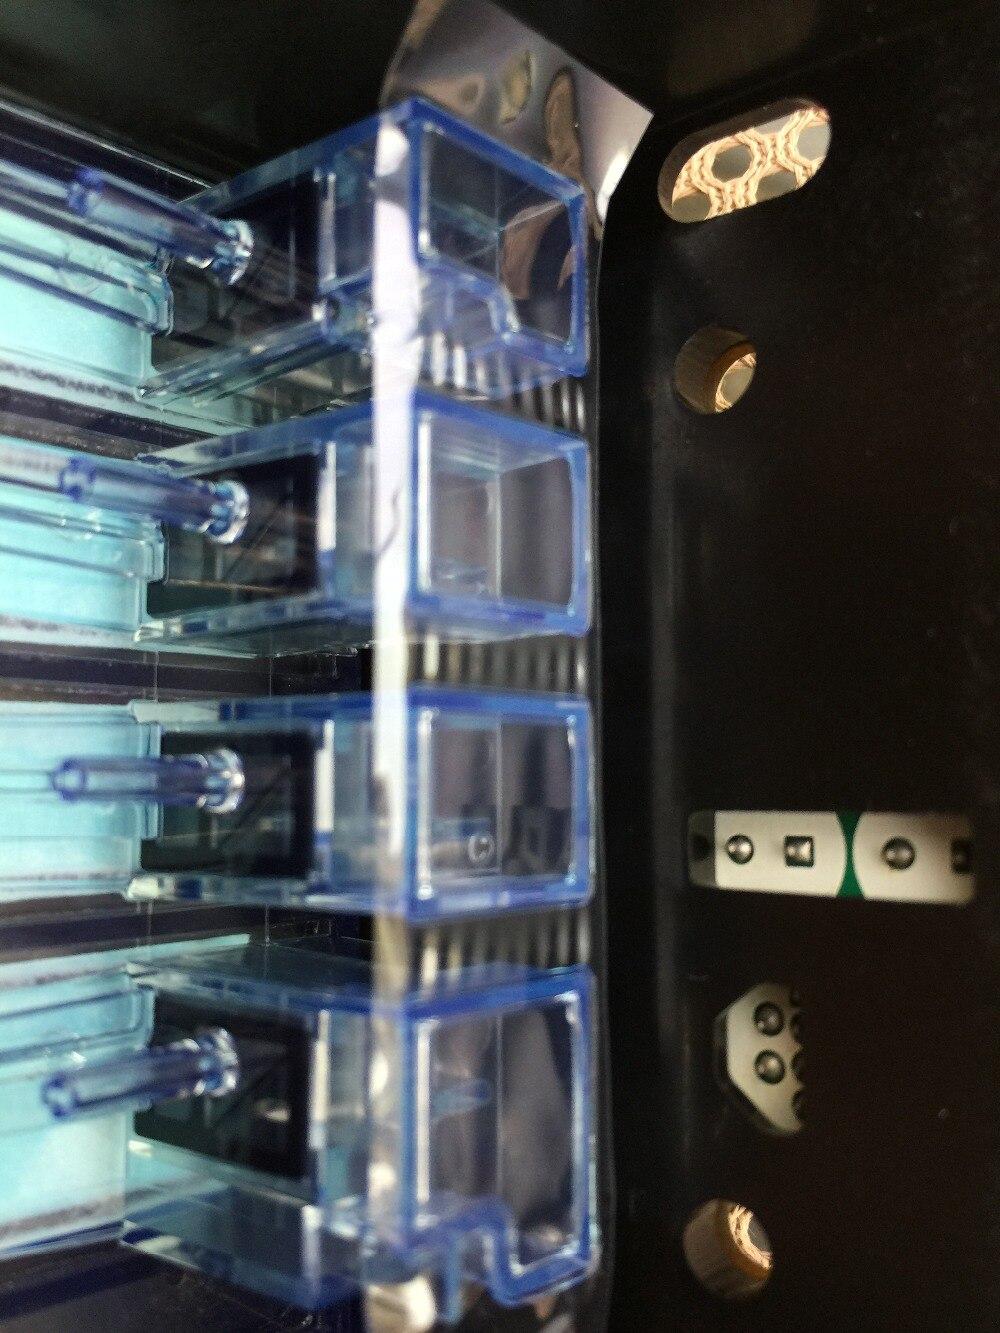 100PCS Brand NEW  PRINTHEAD Genuine OEM Print Head For HP 932 933 for HP 6100 6600 6700 7110 7610 картридж t2 cn053ae 932xl для hp officejet 6100 6600 6700 7110 7610 black